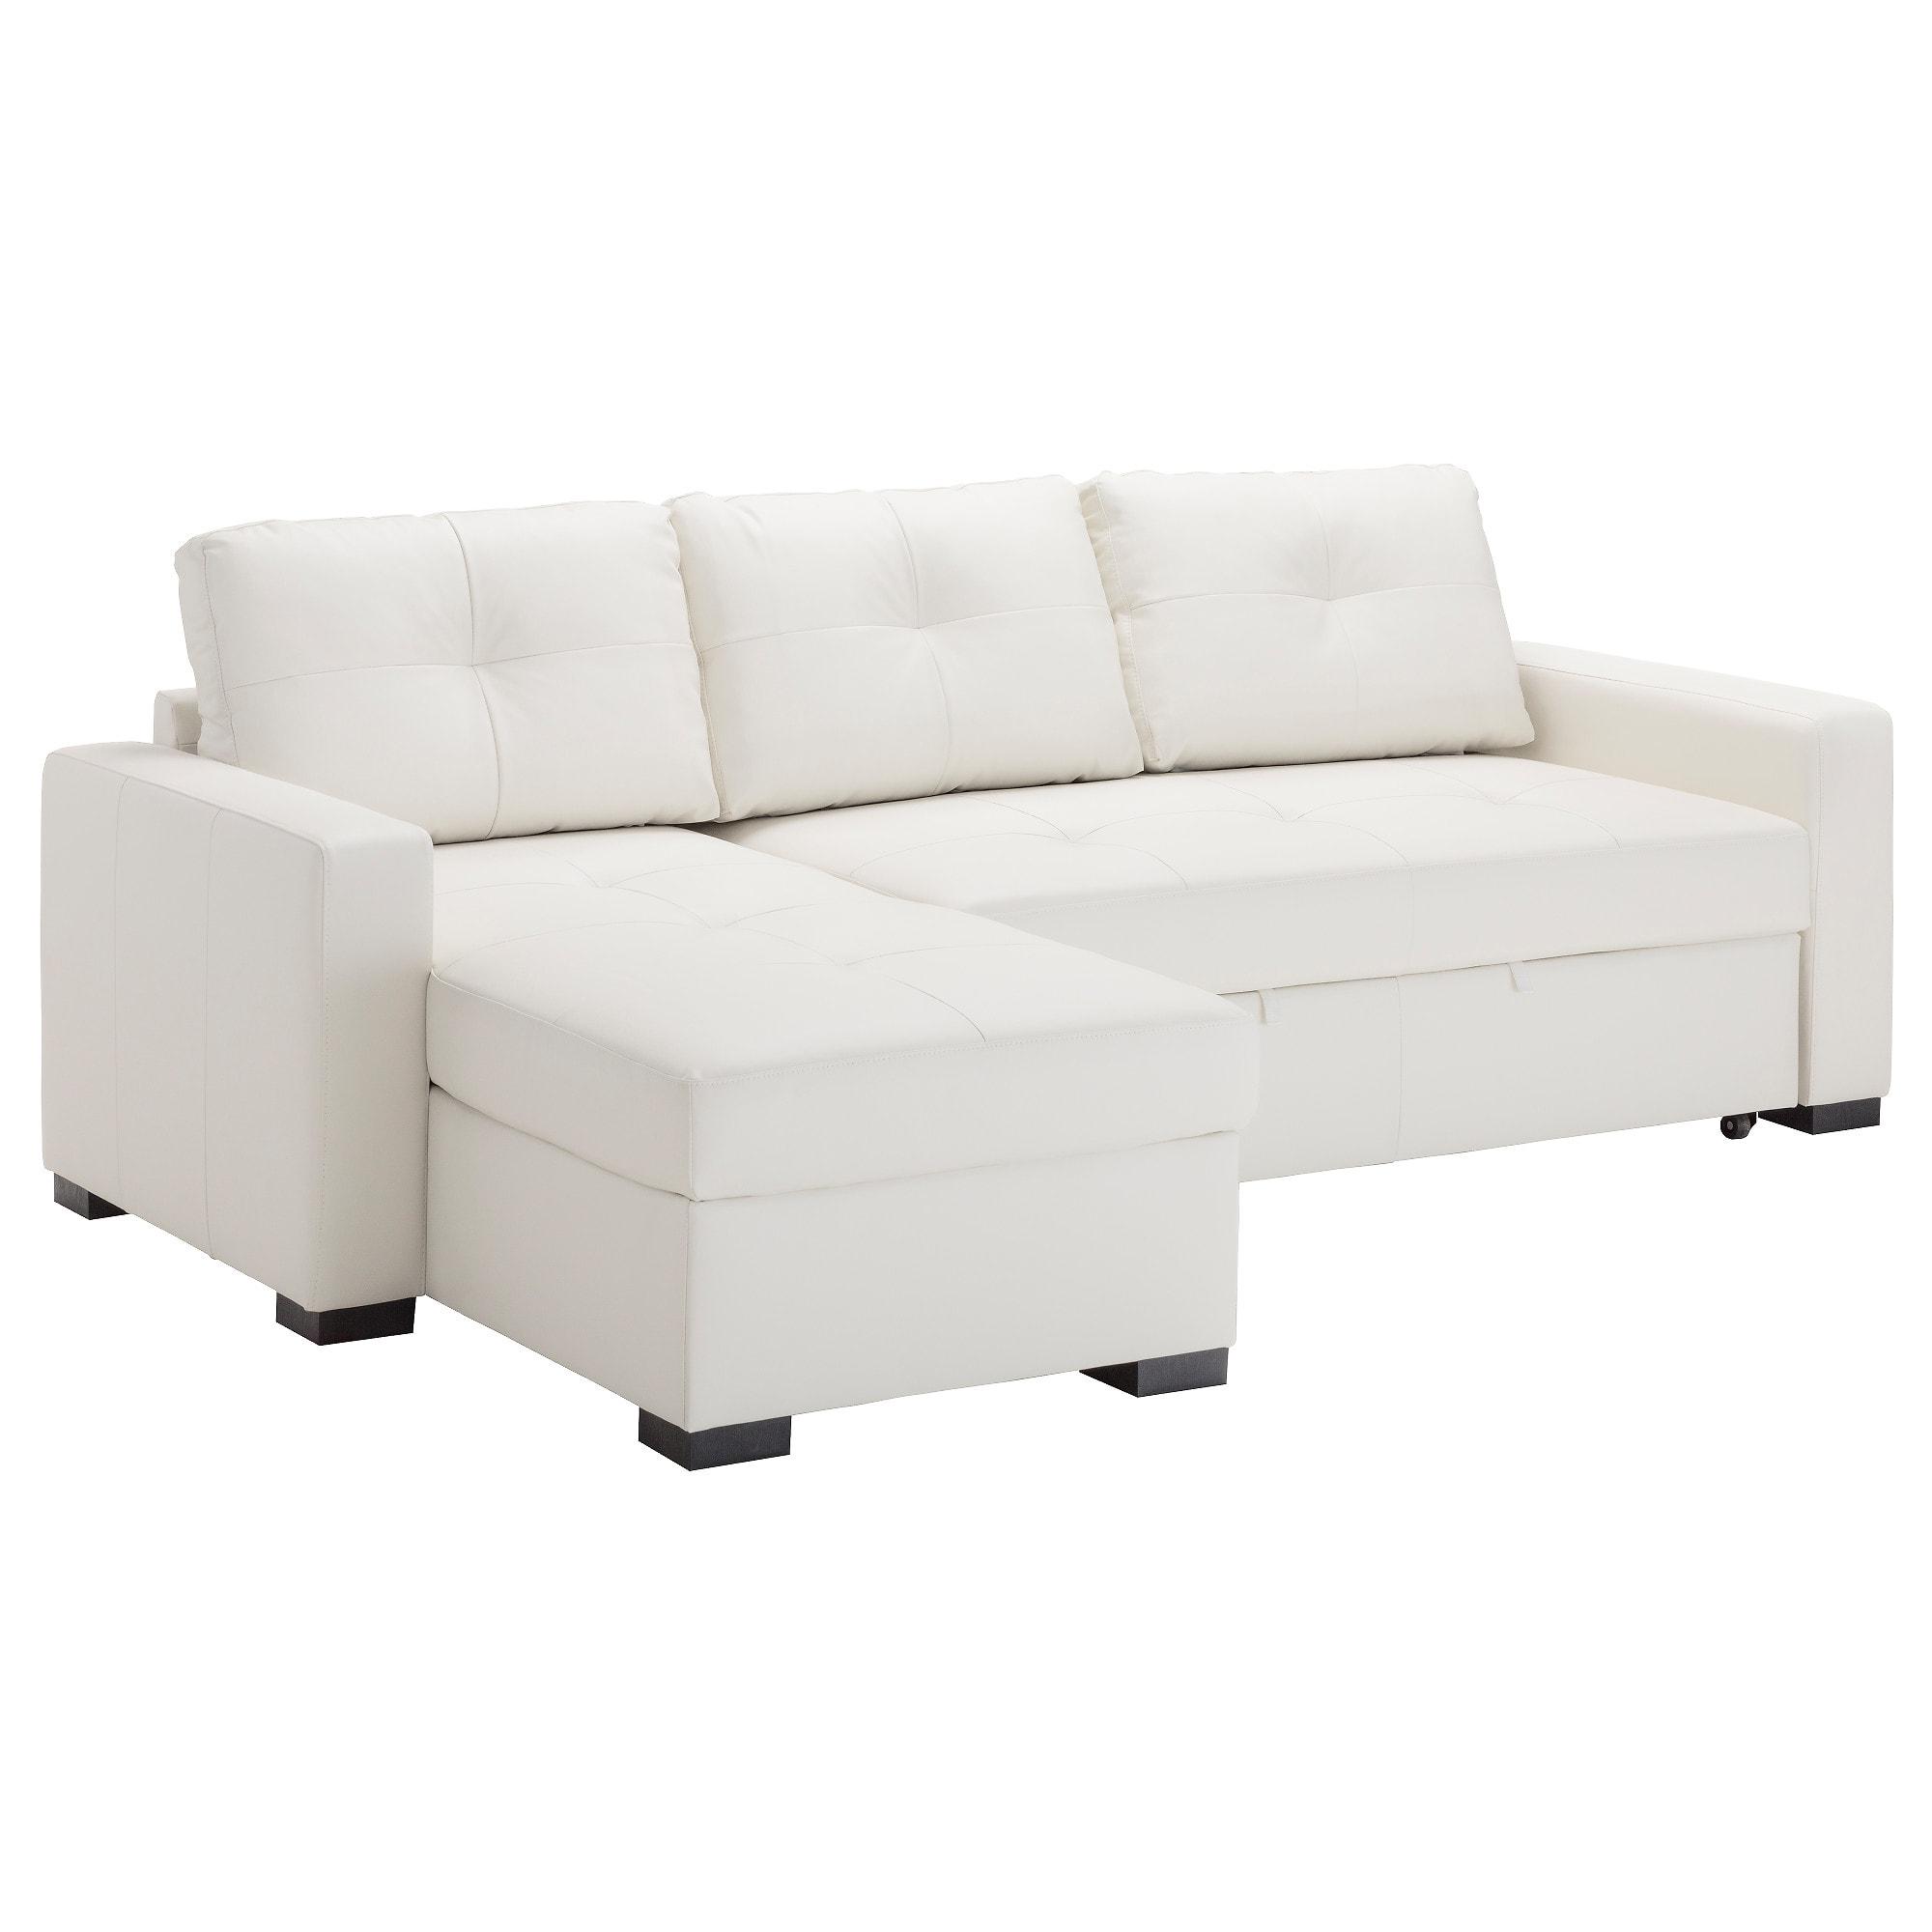 Sillon Cama 1 Plaza Merkamueble 9fdy sofà S Cama De Calidad Pra Online Ikea